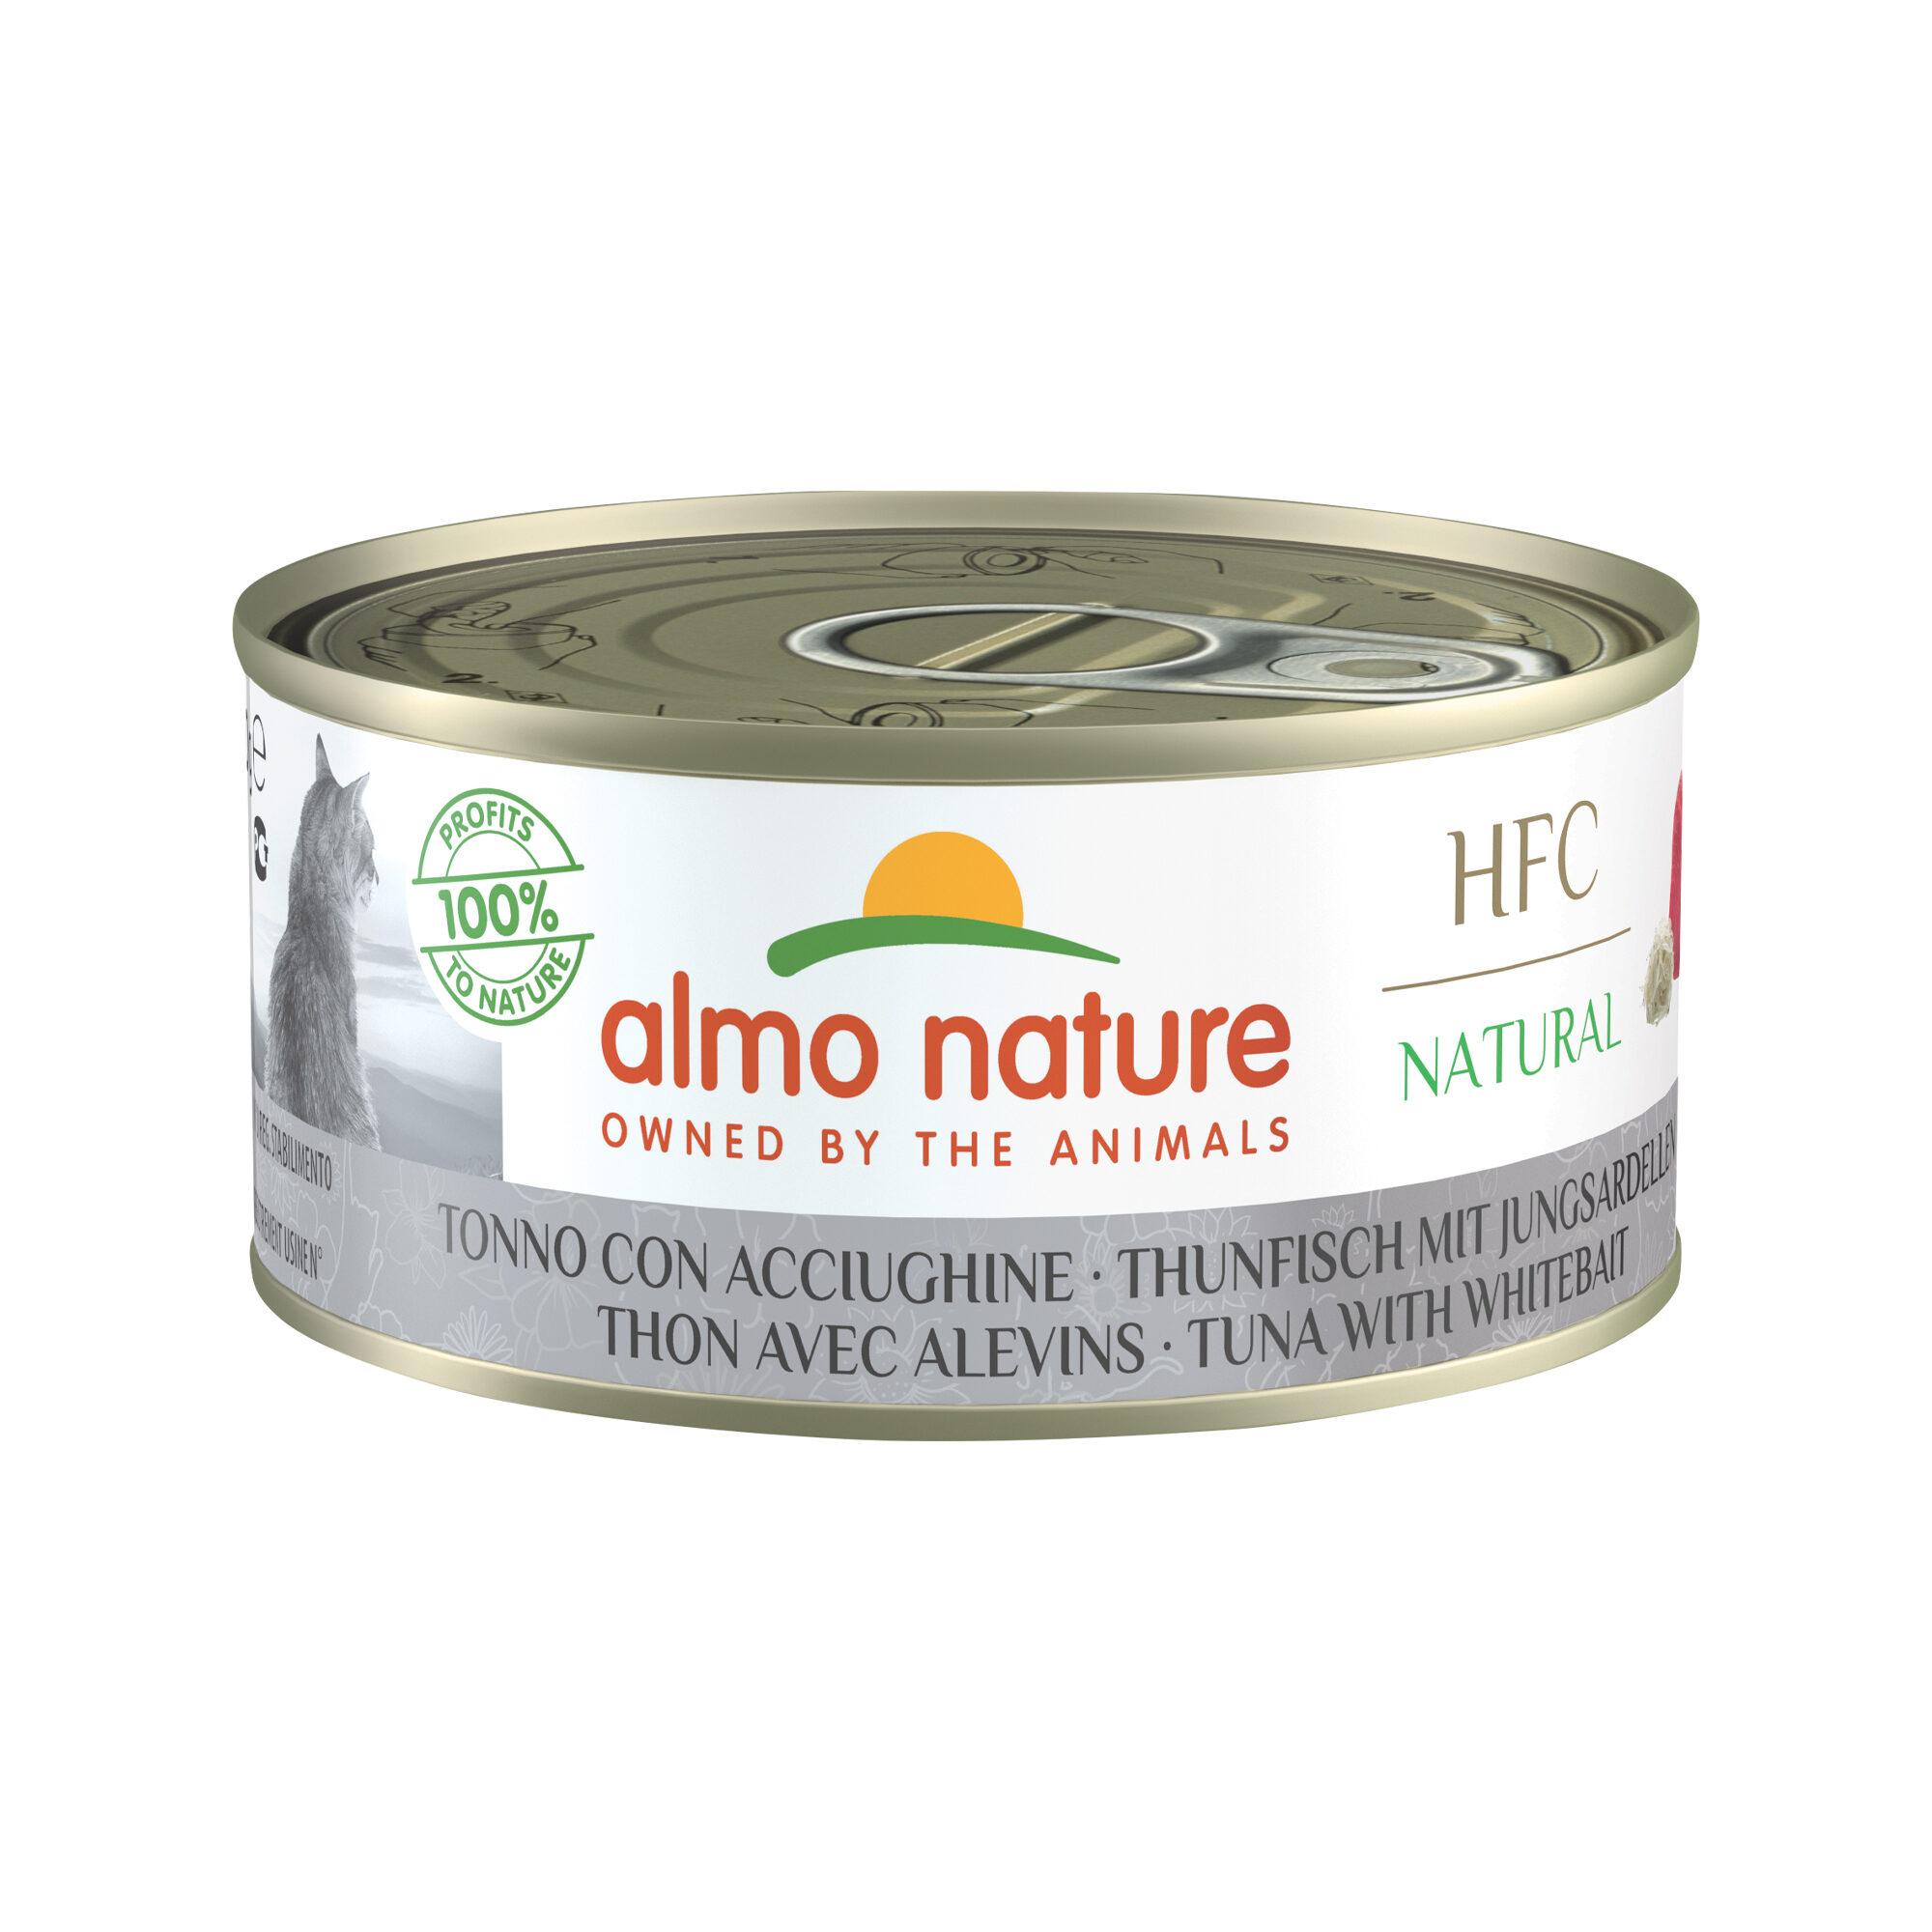 Almo Nature HFC Natural - Thon et sardine